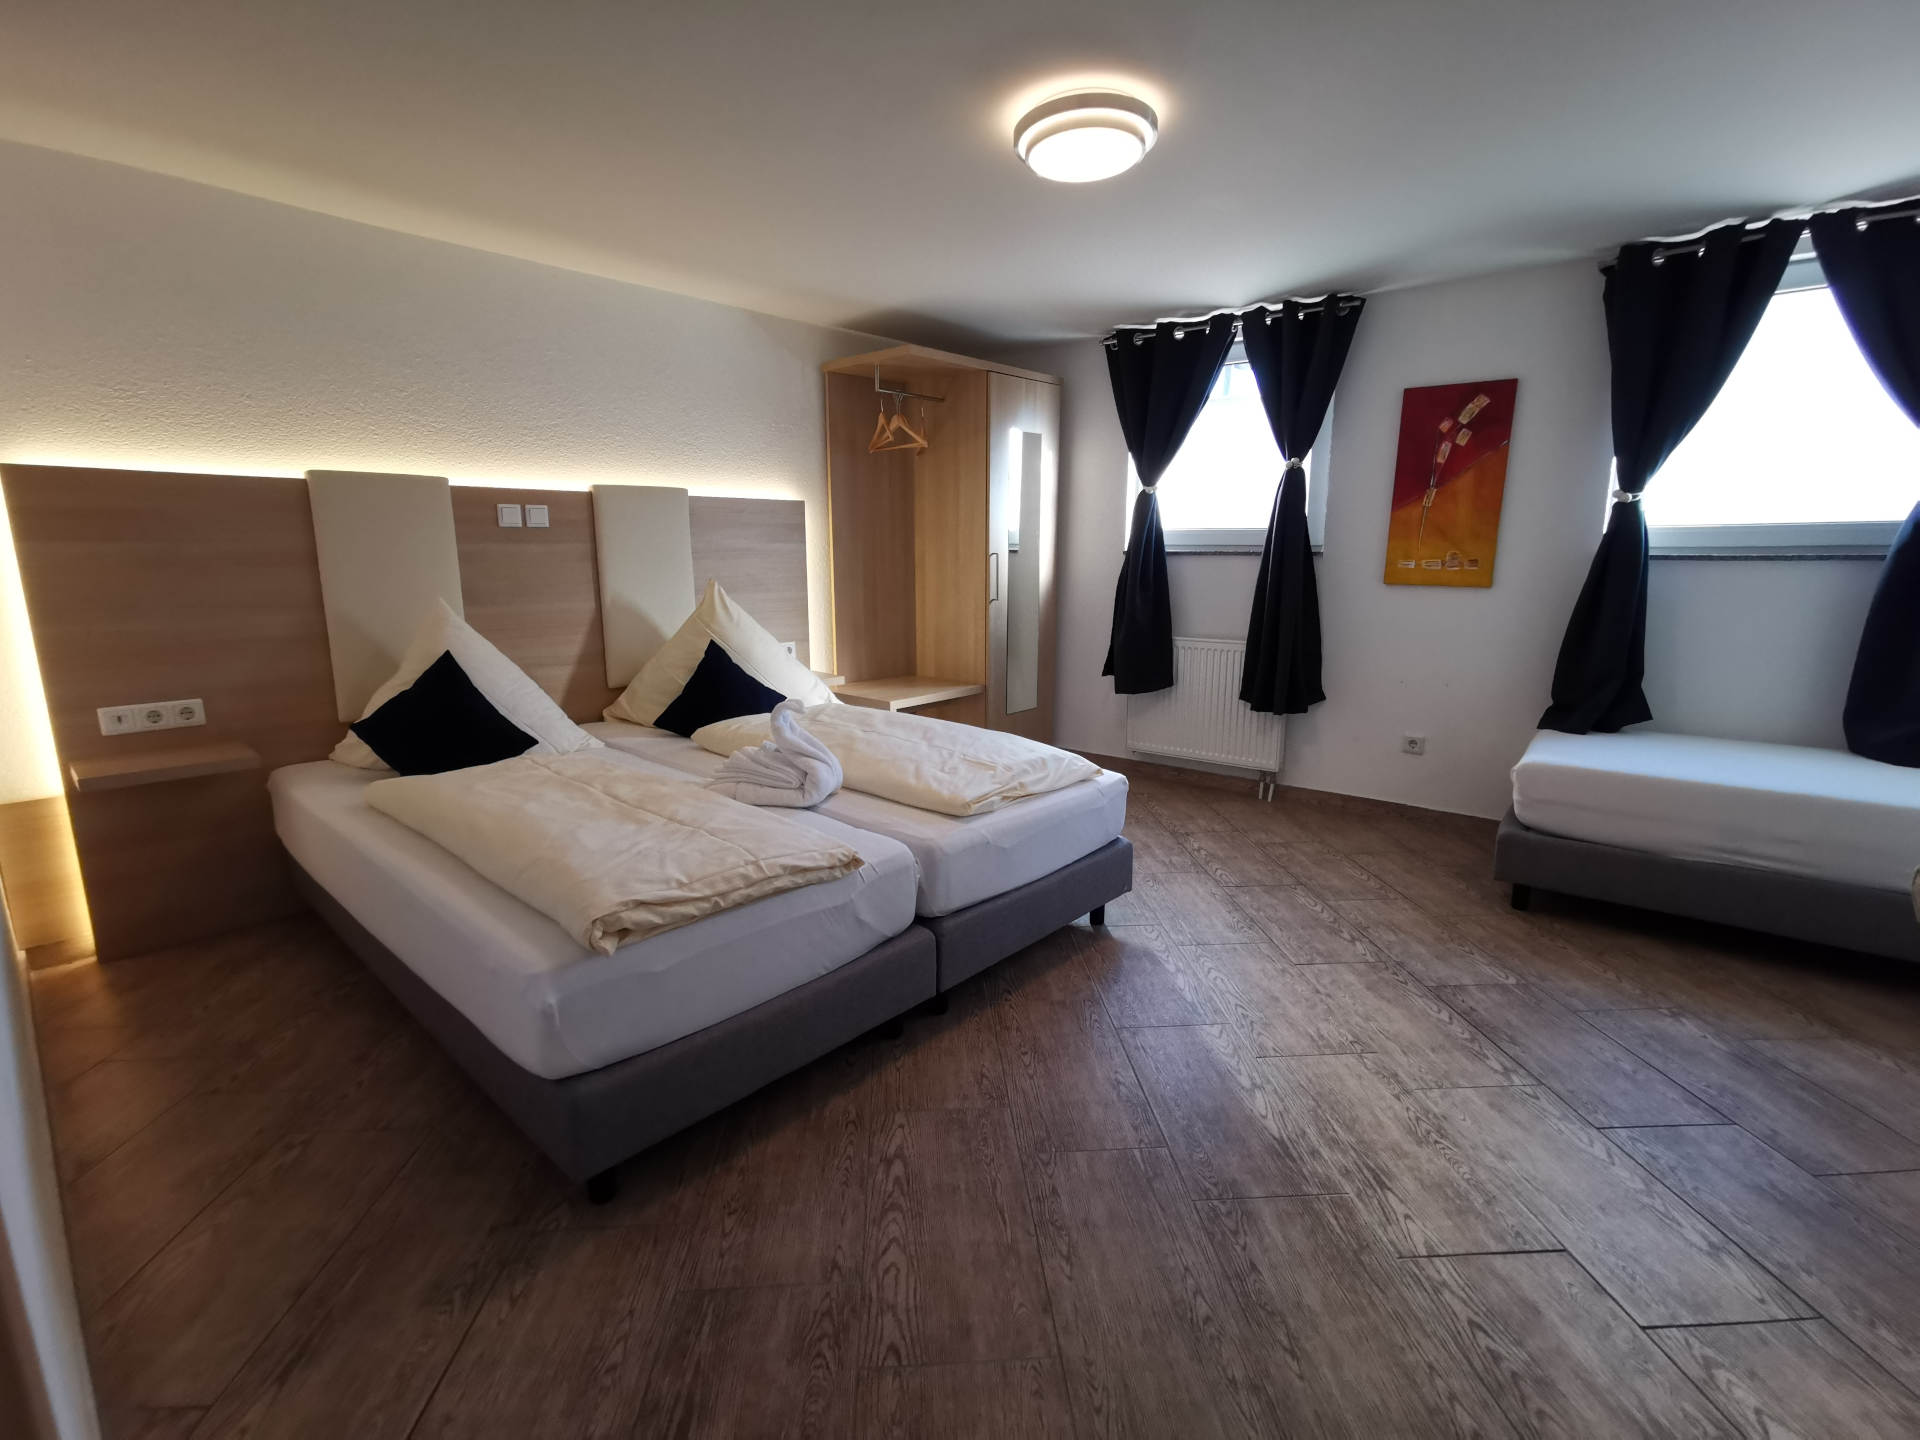 Hotel Mezzero Waldshut-Tiengen doppelzimmer